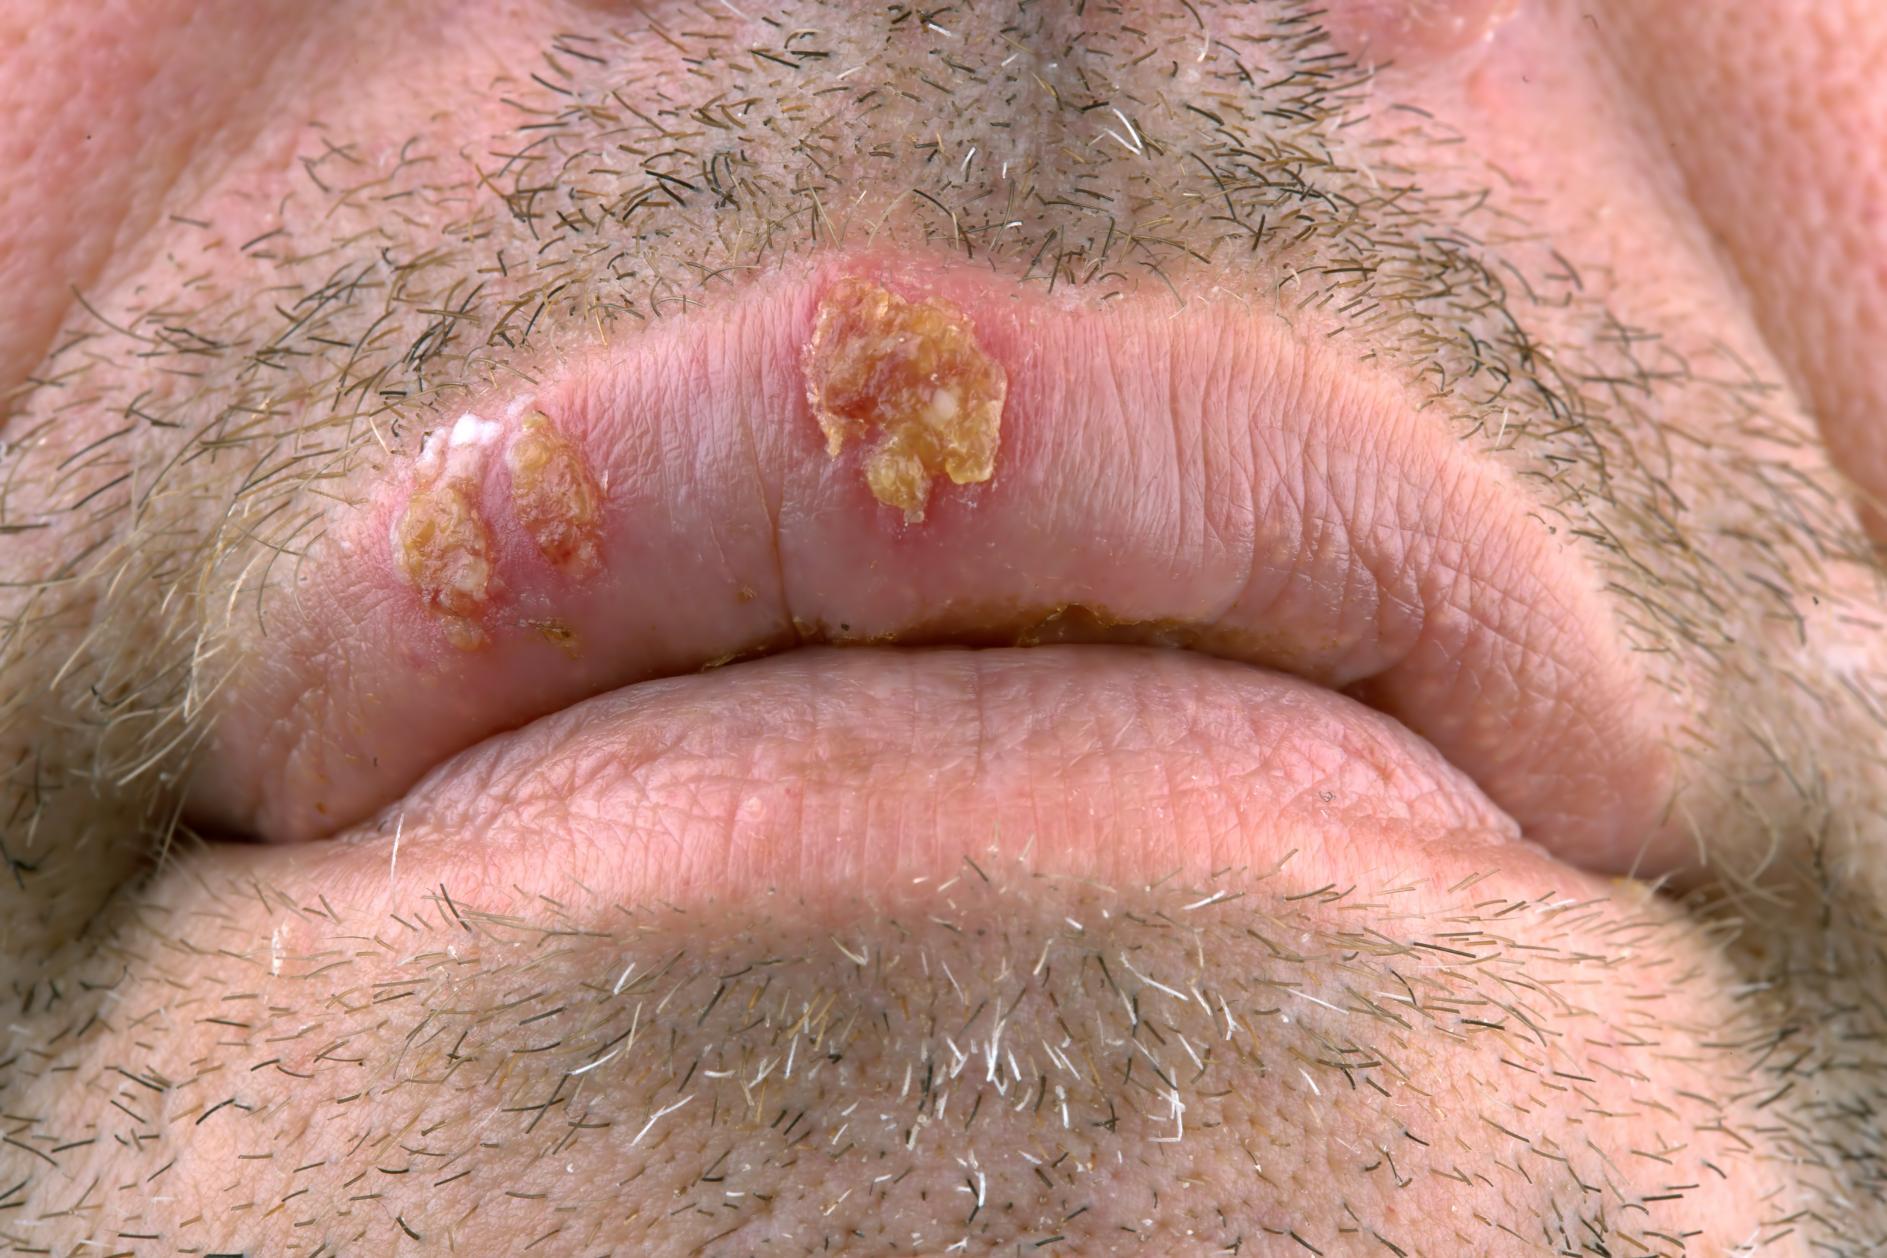 herpes labial, virus, contagio, labio, vhs,. Mediquo, tu amigo médico. Chat médico.